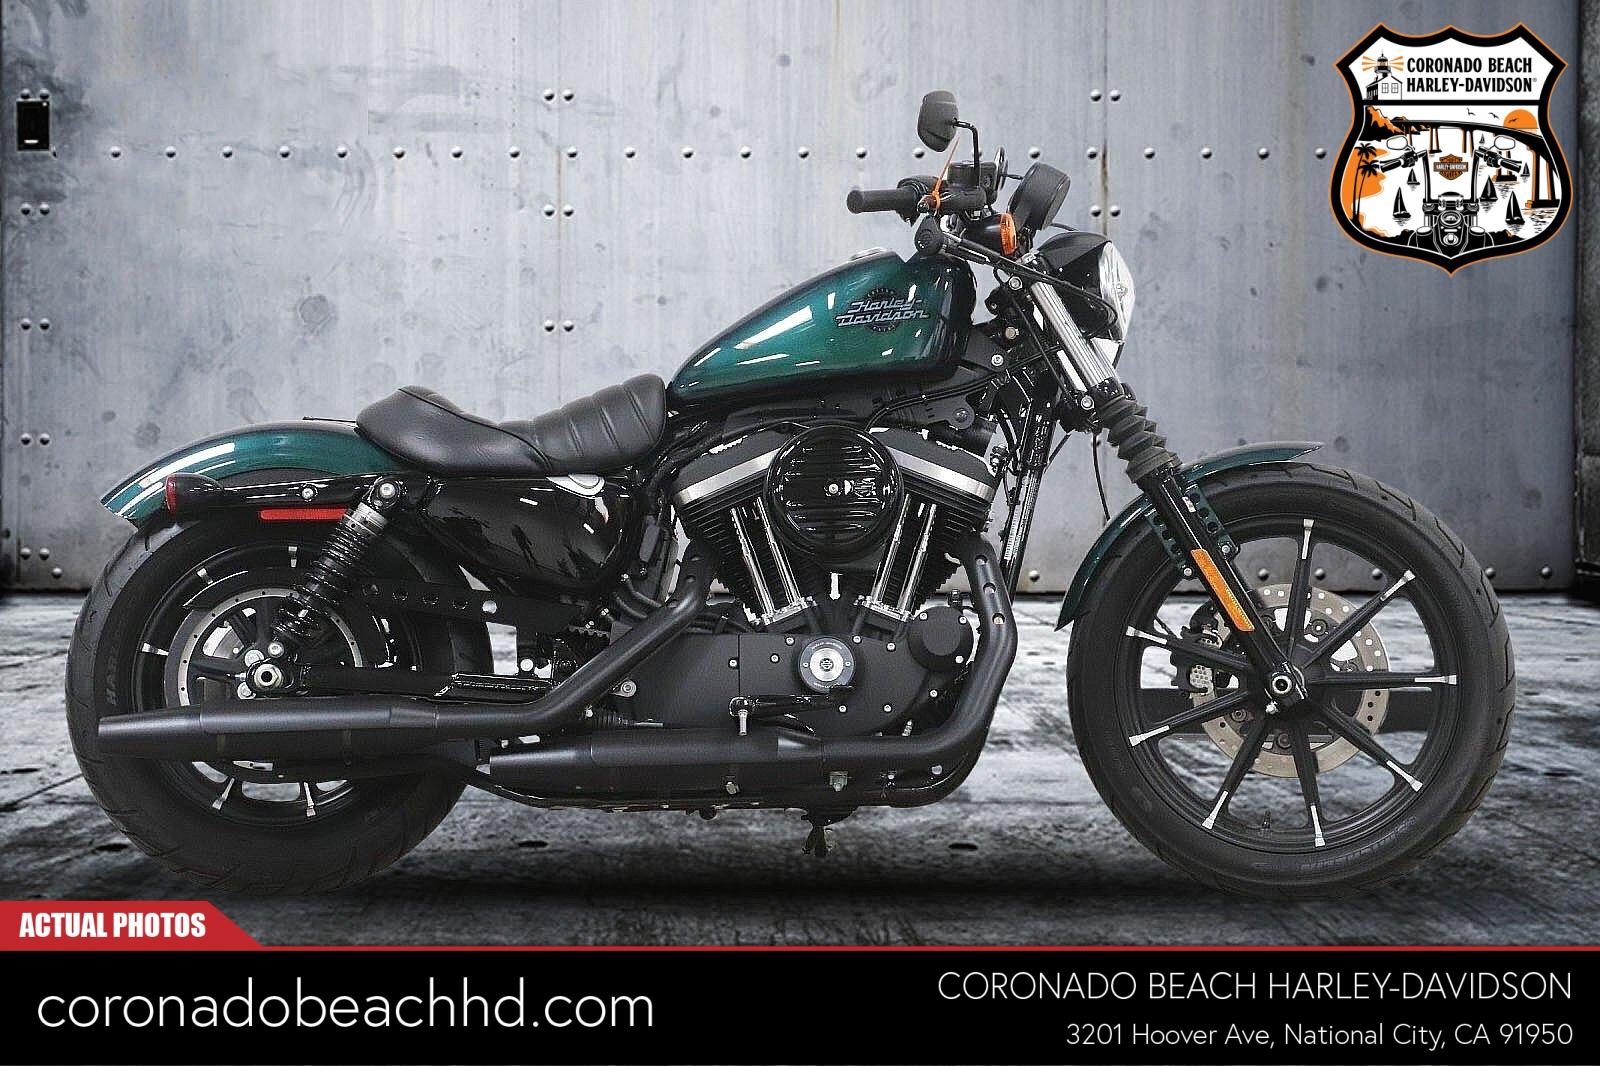 2021 Harley-Davidson Iron 883 [4]